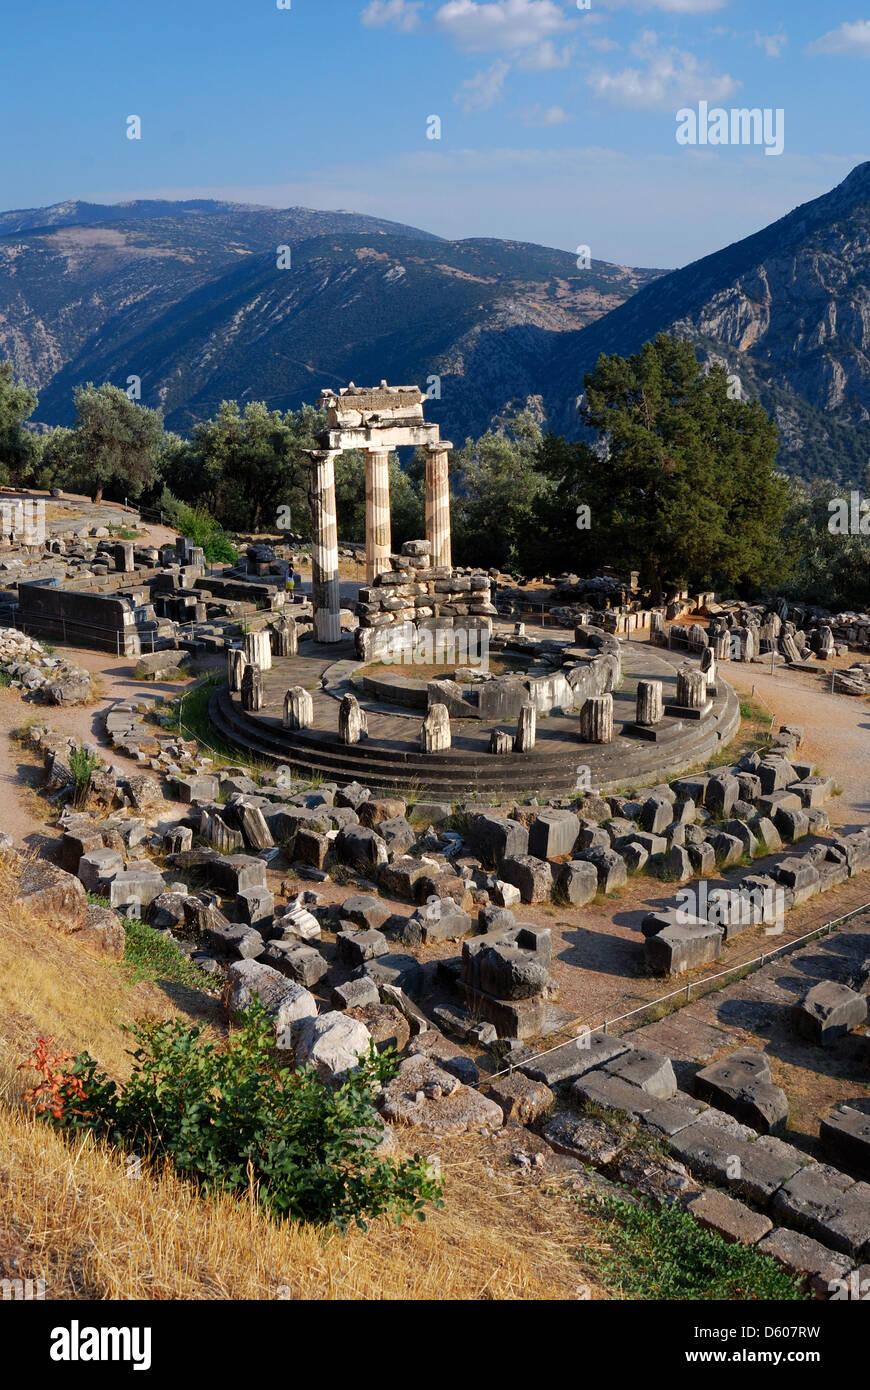 The Tholos at the sanctuary of Athena Pronaia, Delphi, Greece Stock Photo